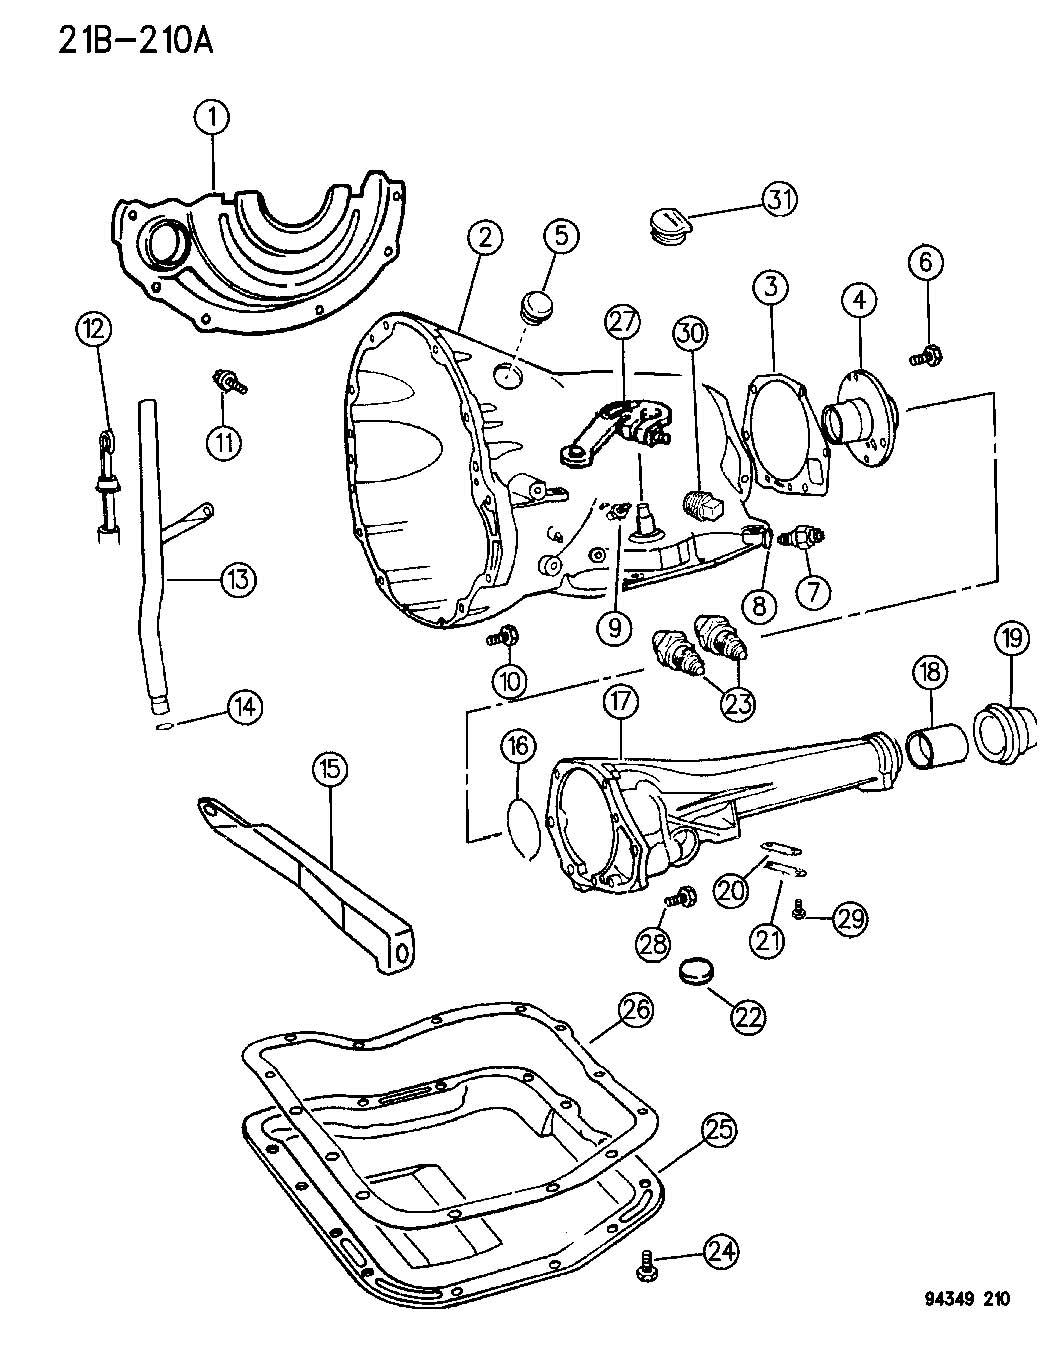 Dodge Ram Grommet Timing Probe Bnd Nbr Panclutch